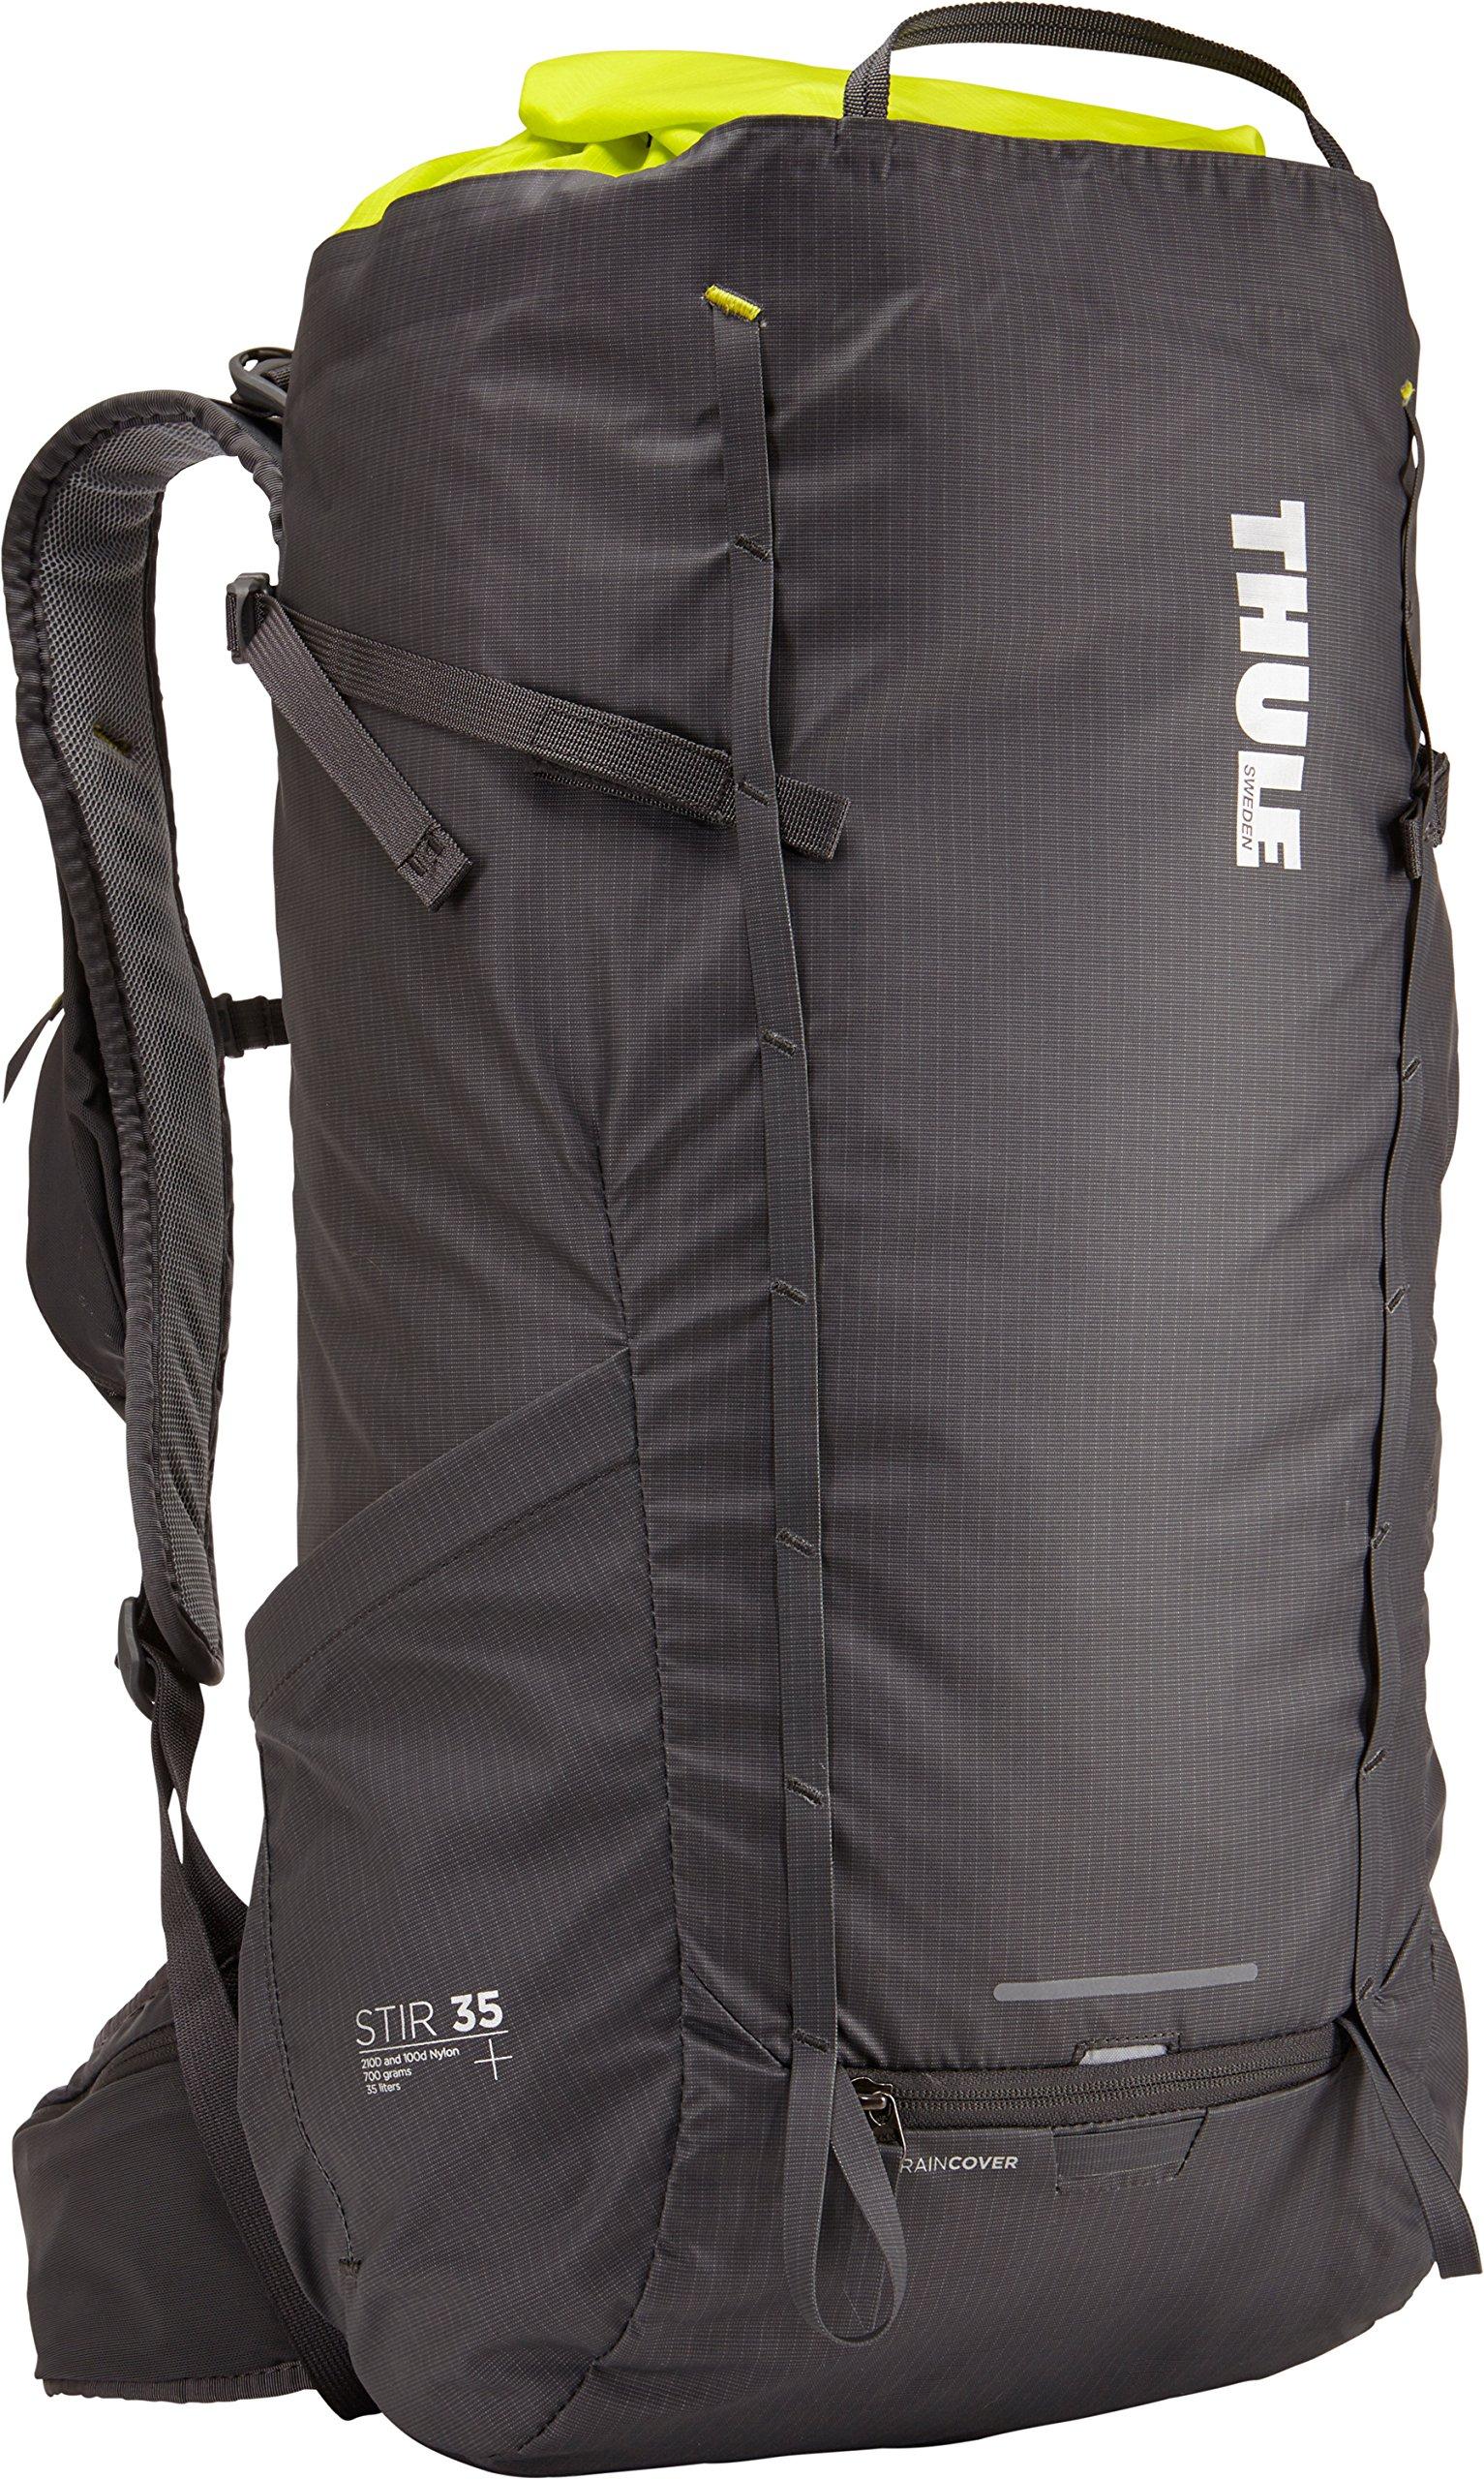 f3a27a2a7 Thule Men's Stir Hiking Pack, Dark Shadow, 35 L - 211400 < Backpacks ...